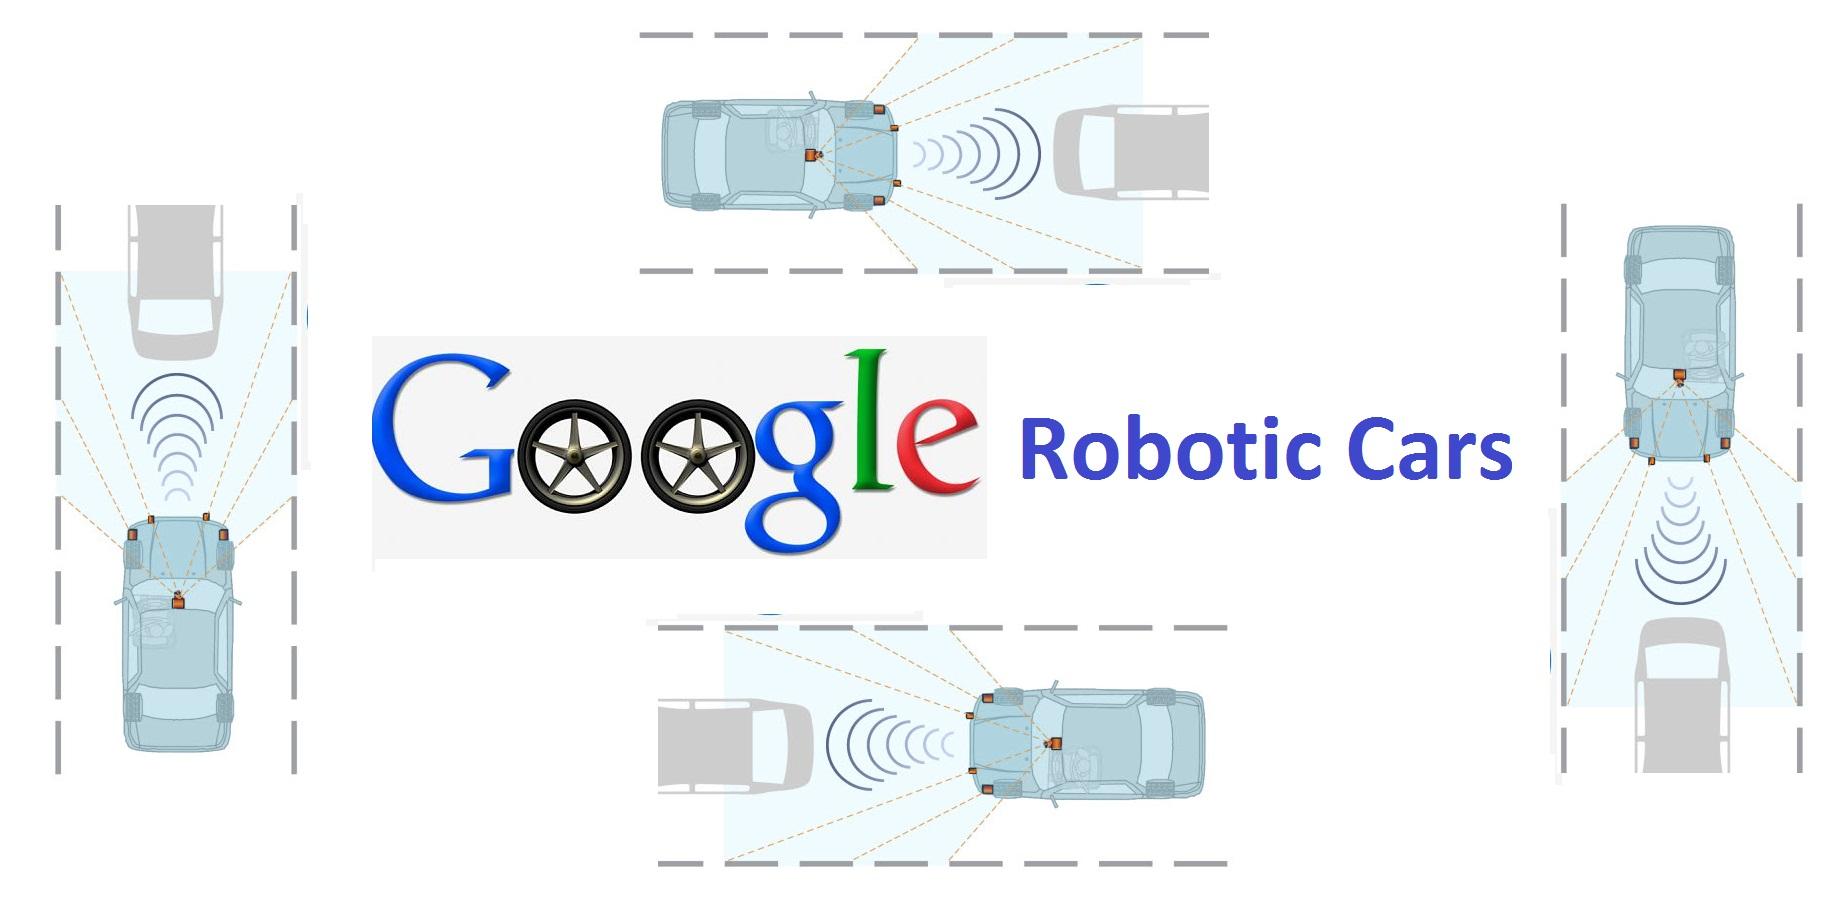 Google Robotic Cars